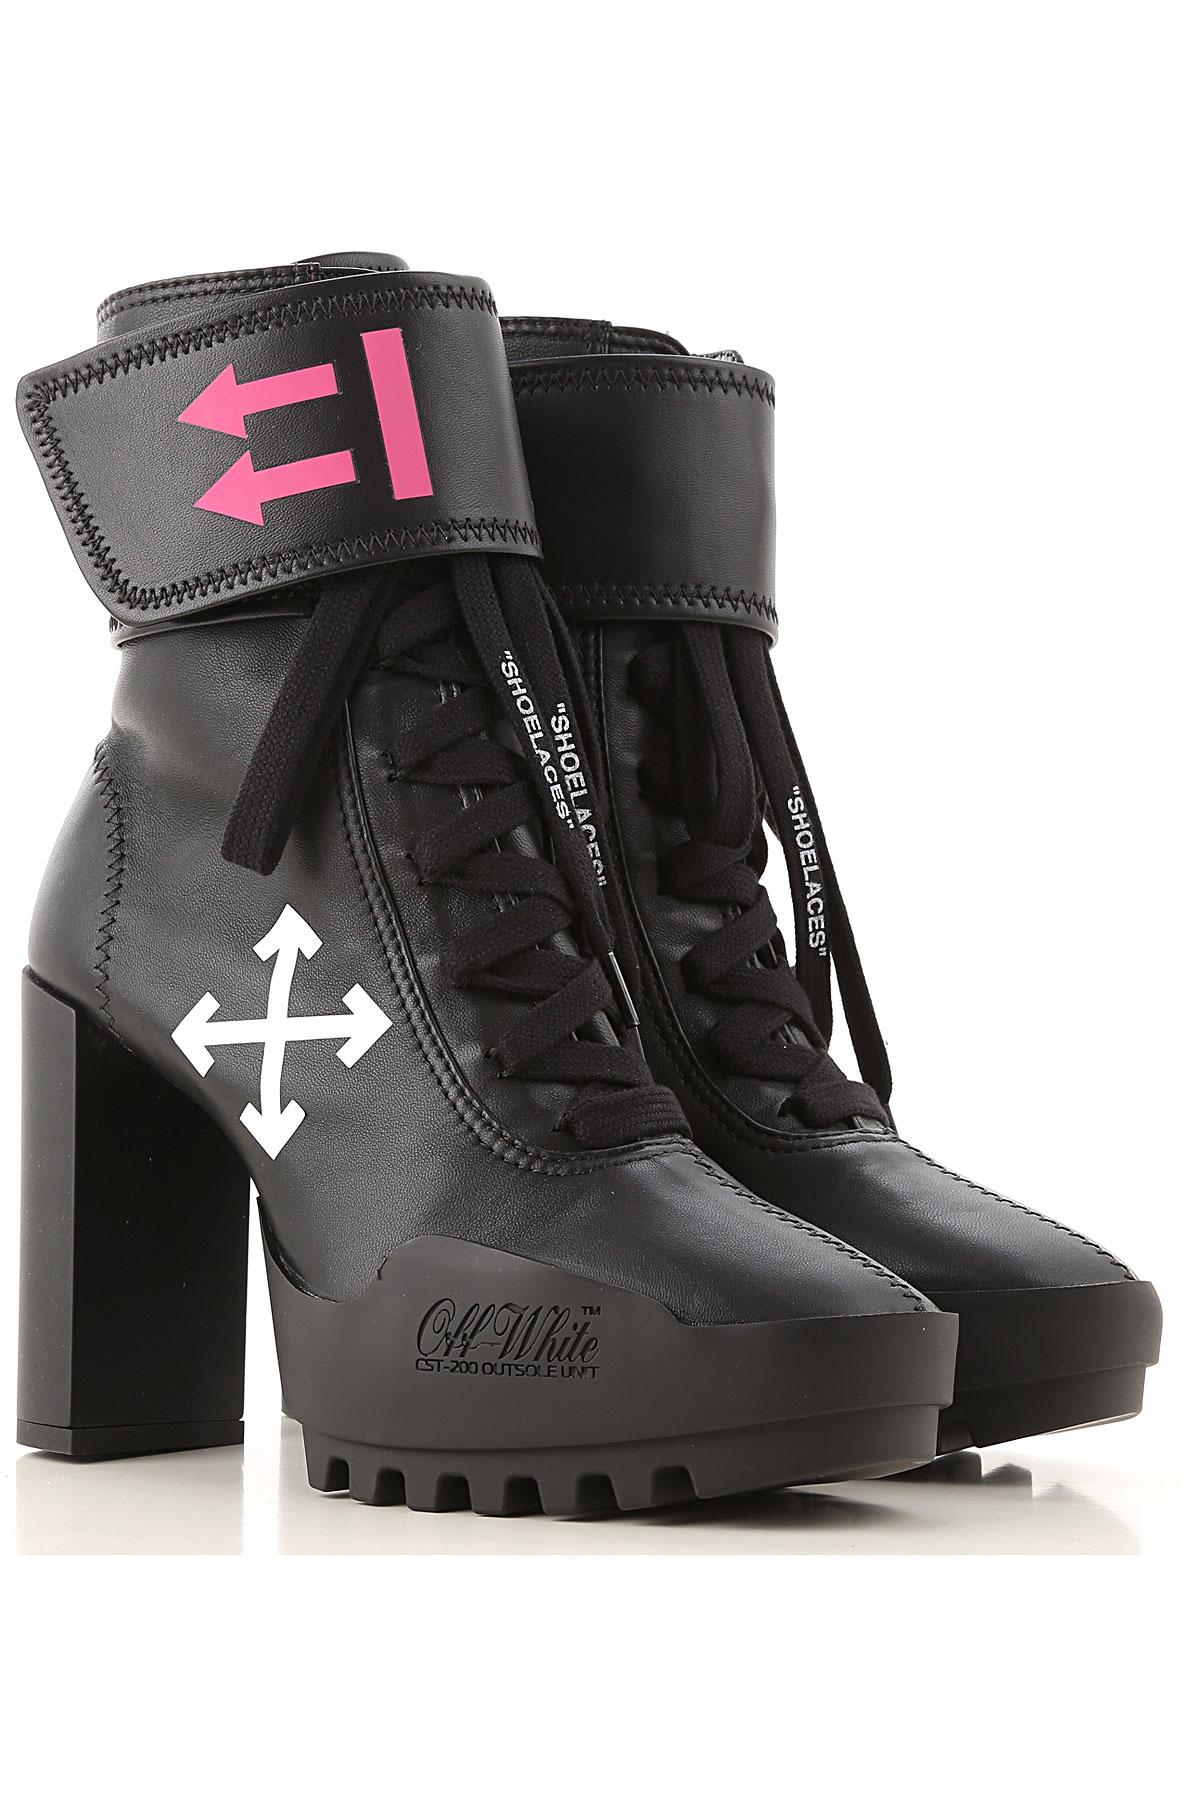 Off-White Virgil Abloh Boots for Women, Booties On Sale, Black, Leather, 2019, US 9 (EU 40) US 8 (EU 39) US 7 (EU 38) US 5 (EU 36)